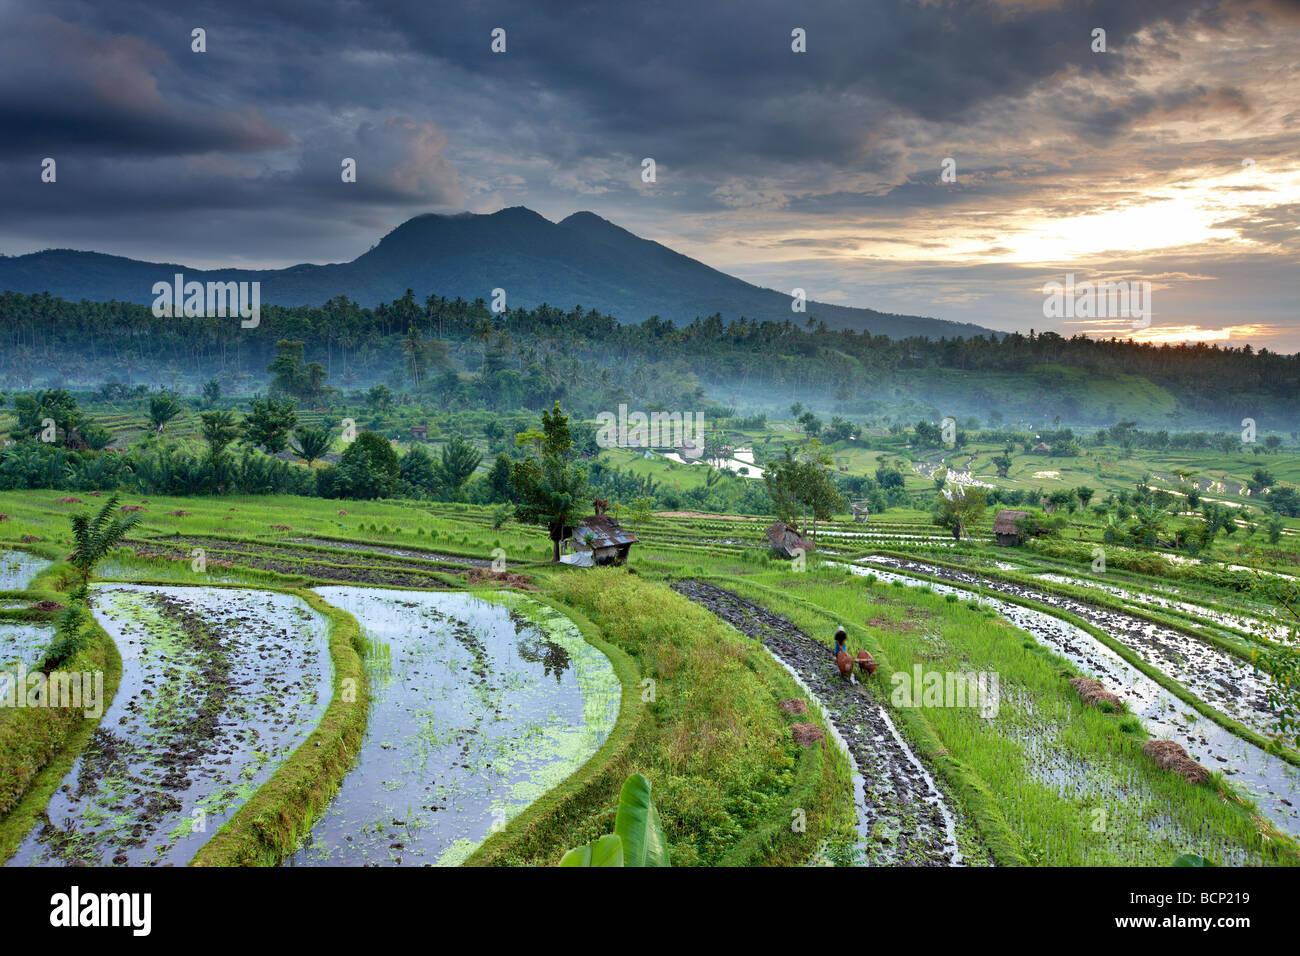 Ochsen angetrieben Pflug in den terrassenförmig angelegten Reis Felder nr Tirtagangga im Morgengrauen mit der vulkanischen Stockfoto